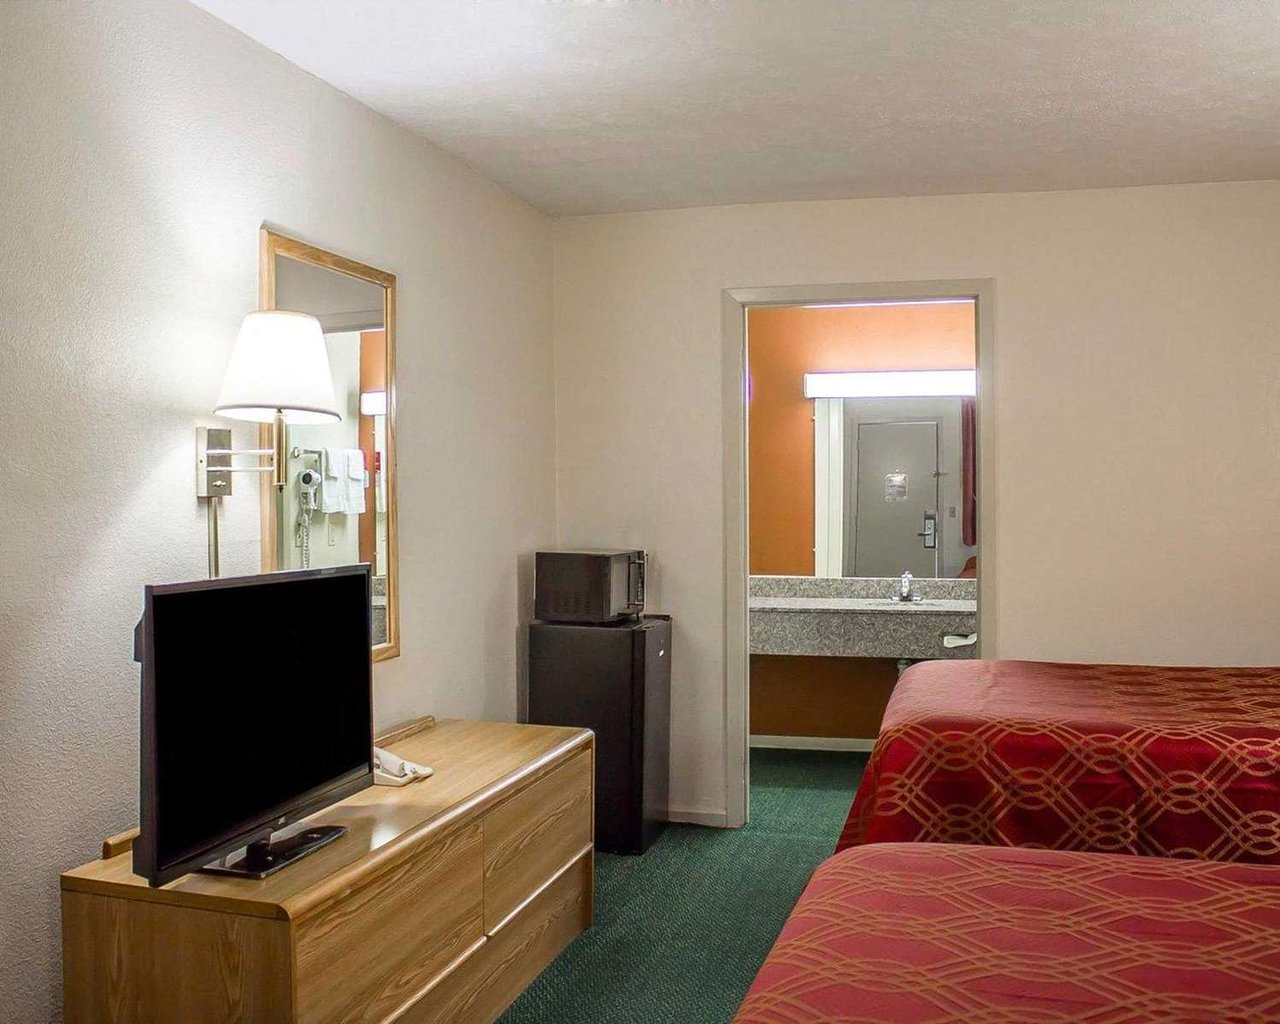 Econo Lodge 45 5 6 Updated 2019 Prices Motel